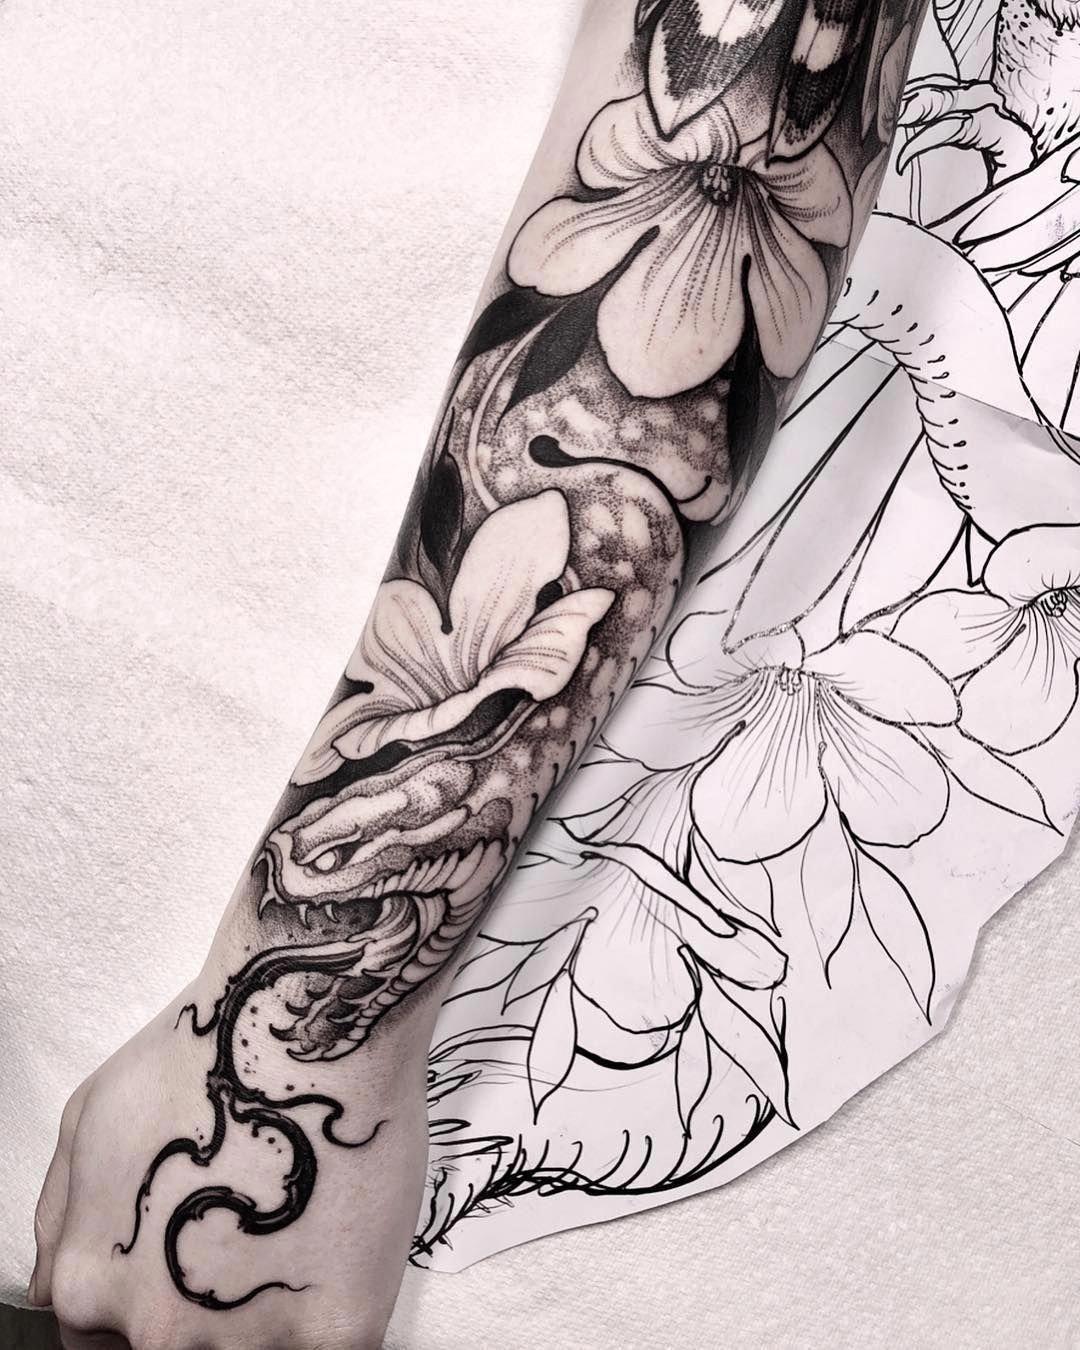 Tattoo Sleeve Generator: Snake And Flowers Tattoo Sleeve By @brunosantostattoo